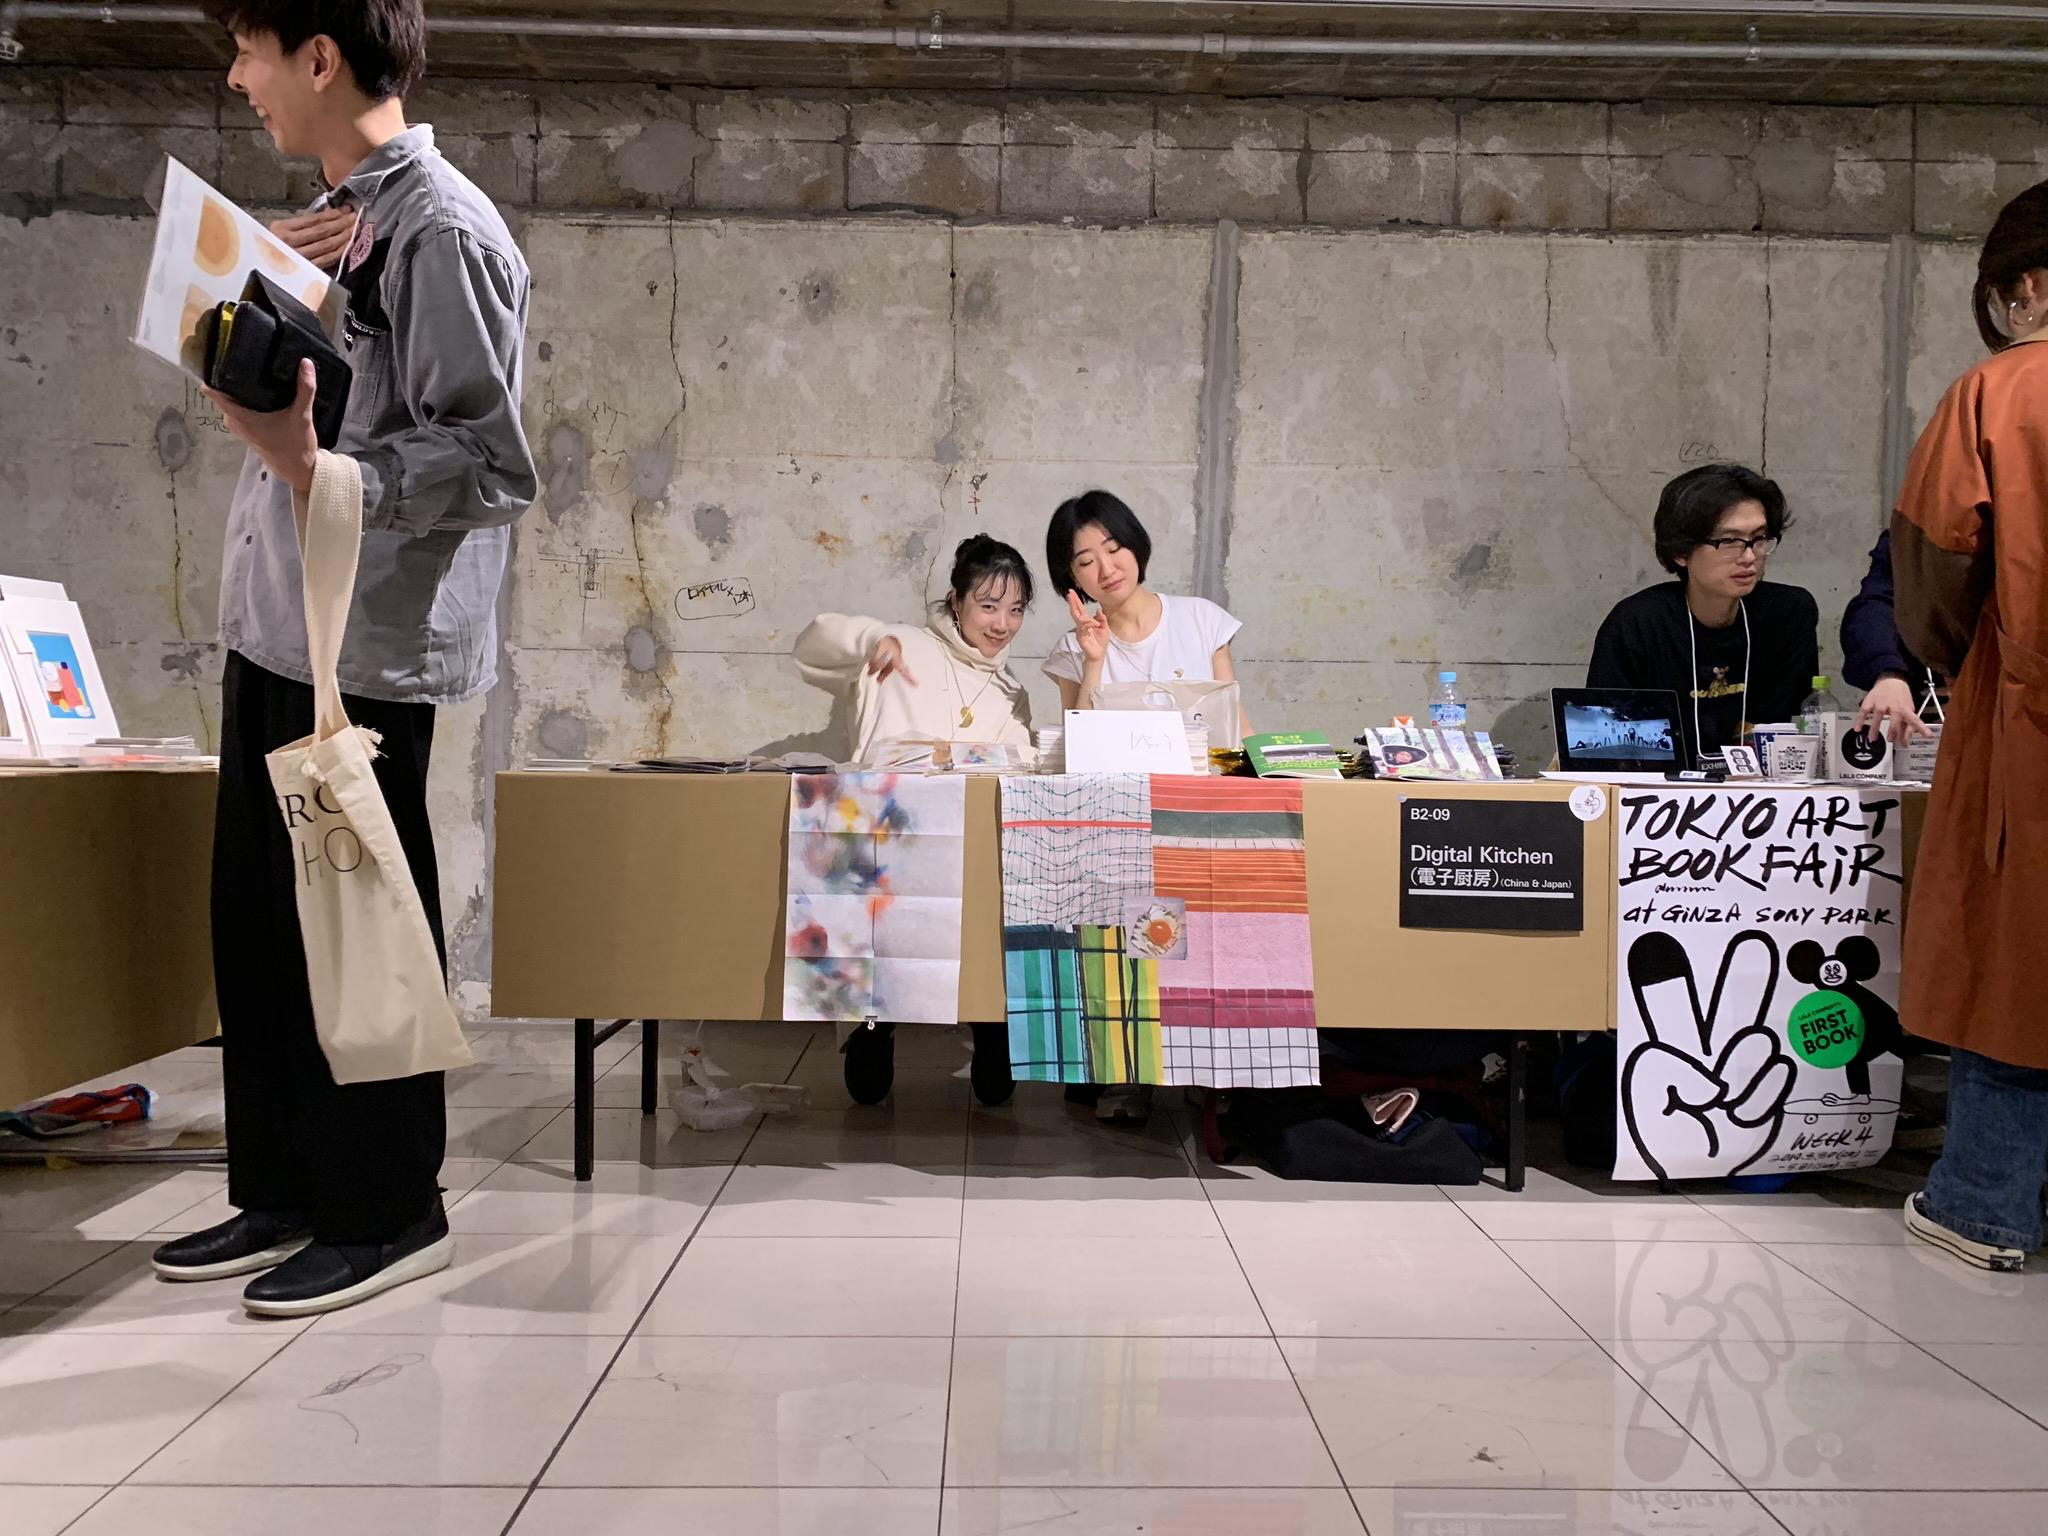 tokyo art book fair@ginza - Tokyo,2019 March